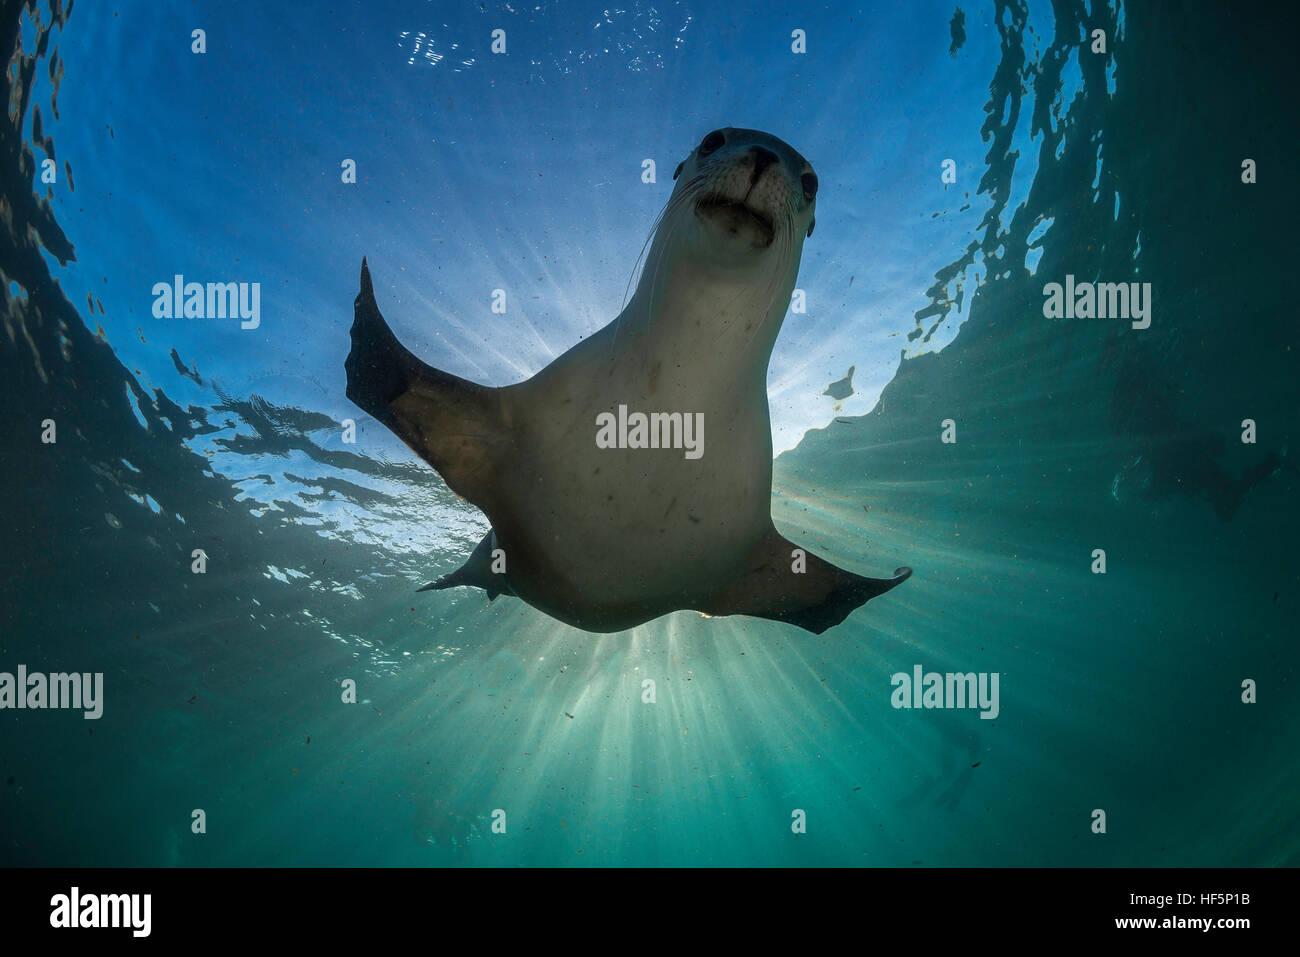 Australian sea lion underwater view, Neptune Islands, South Australia. - Stock Image